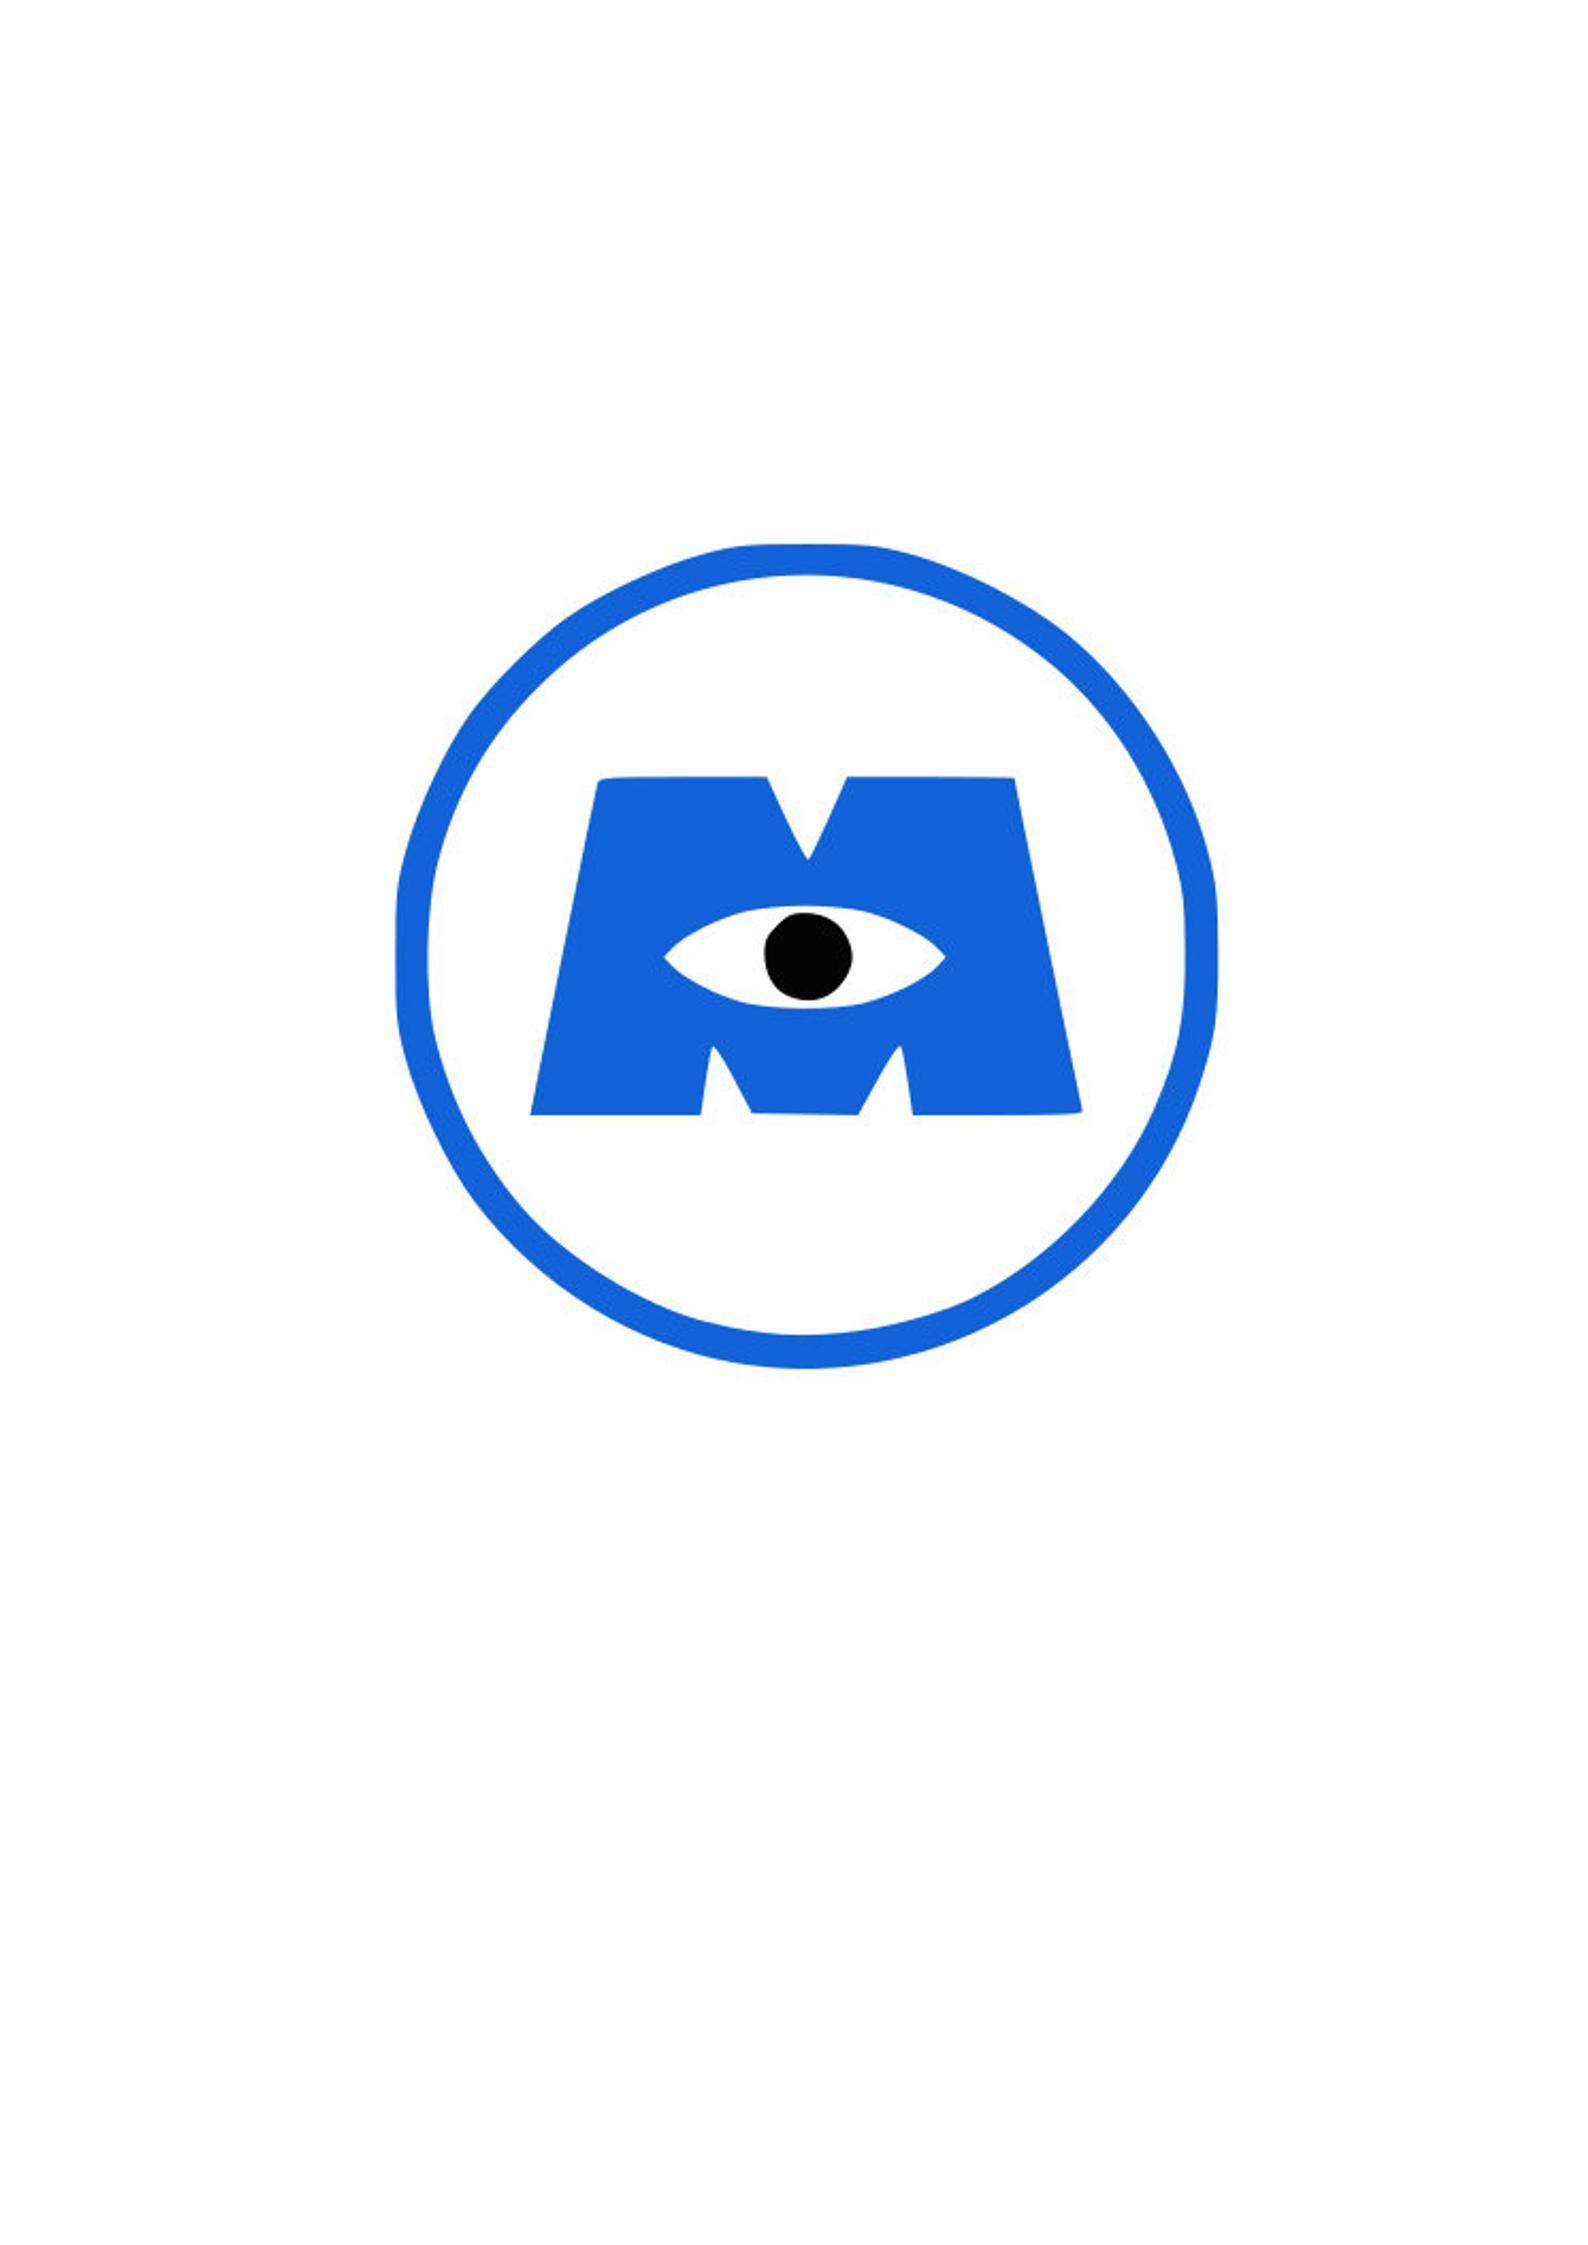 Monsters Inc Logo Vinyl Decal Pixar Car Laptop Cup Sticker Etsy Monsters Inc Logo Monsters Inc Vinyl Decals